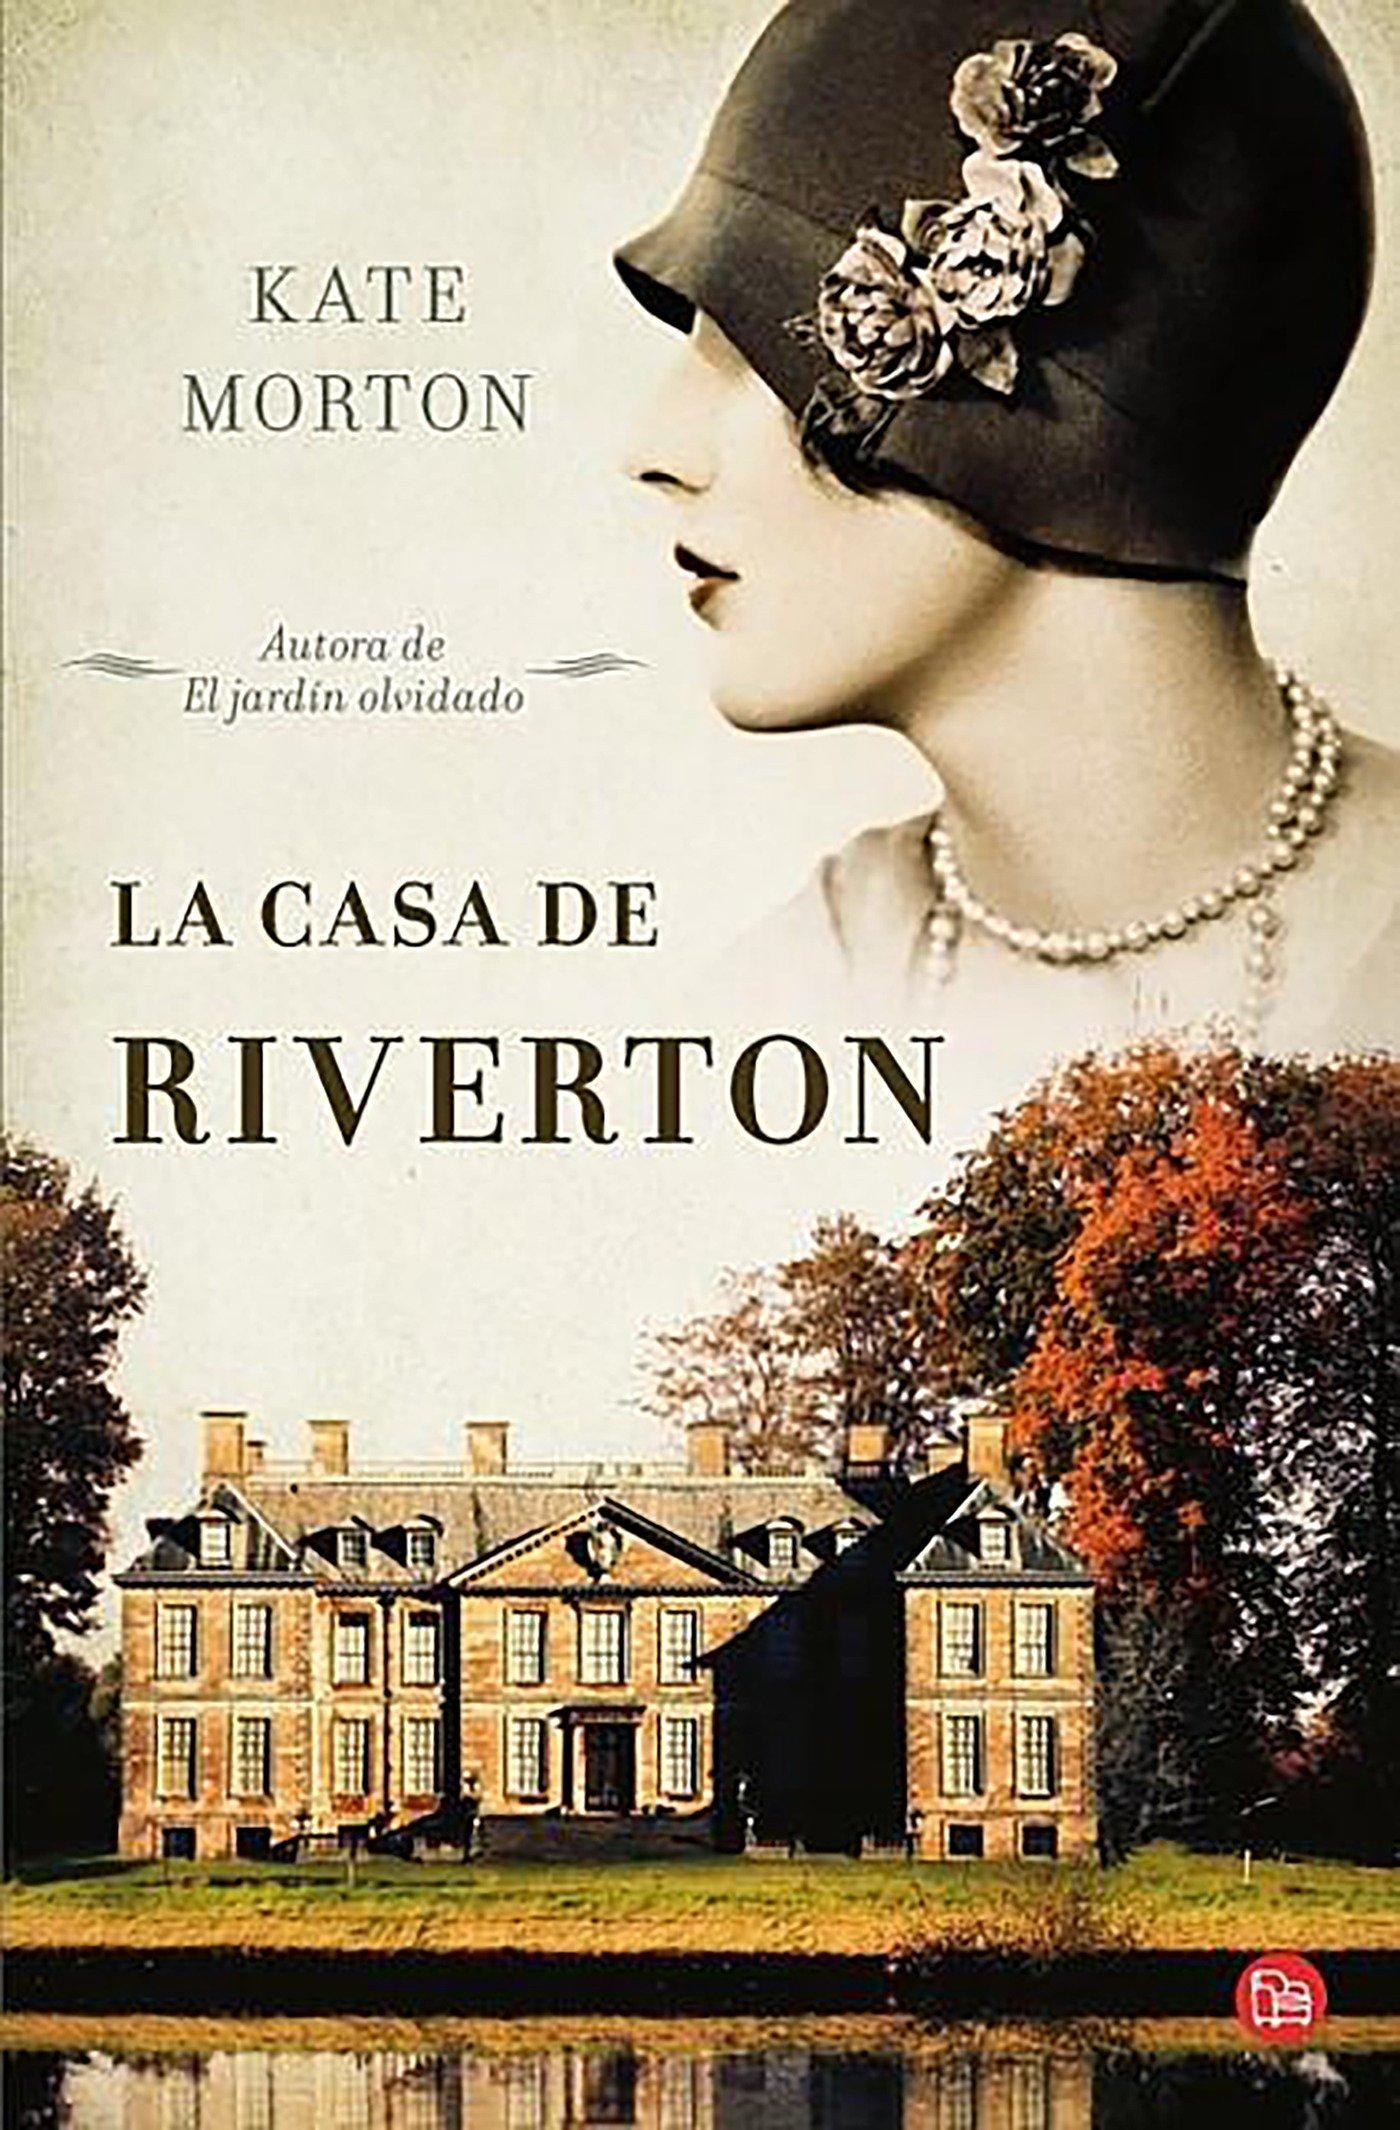 La casa de Riverton (FORMATO GRANDE, Band 730014)